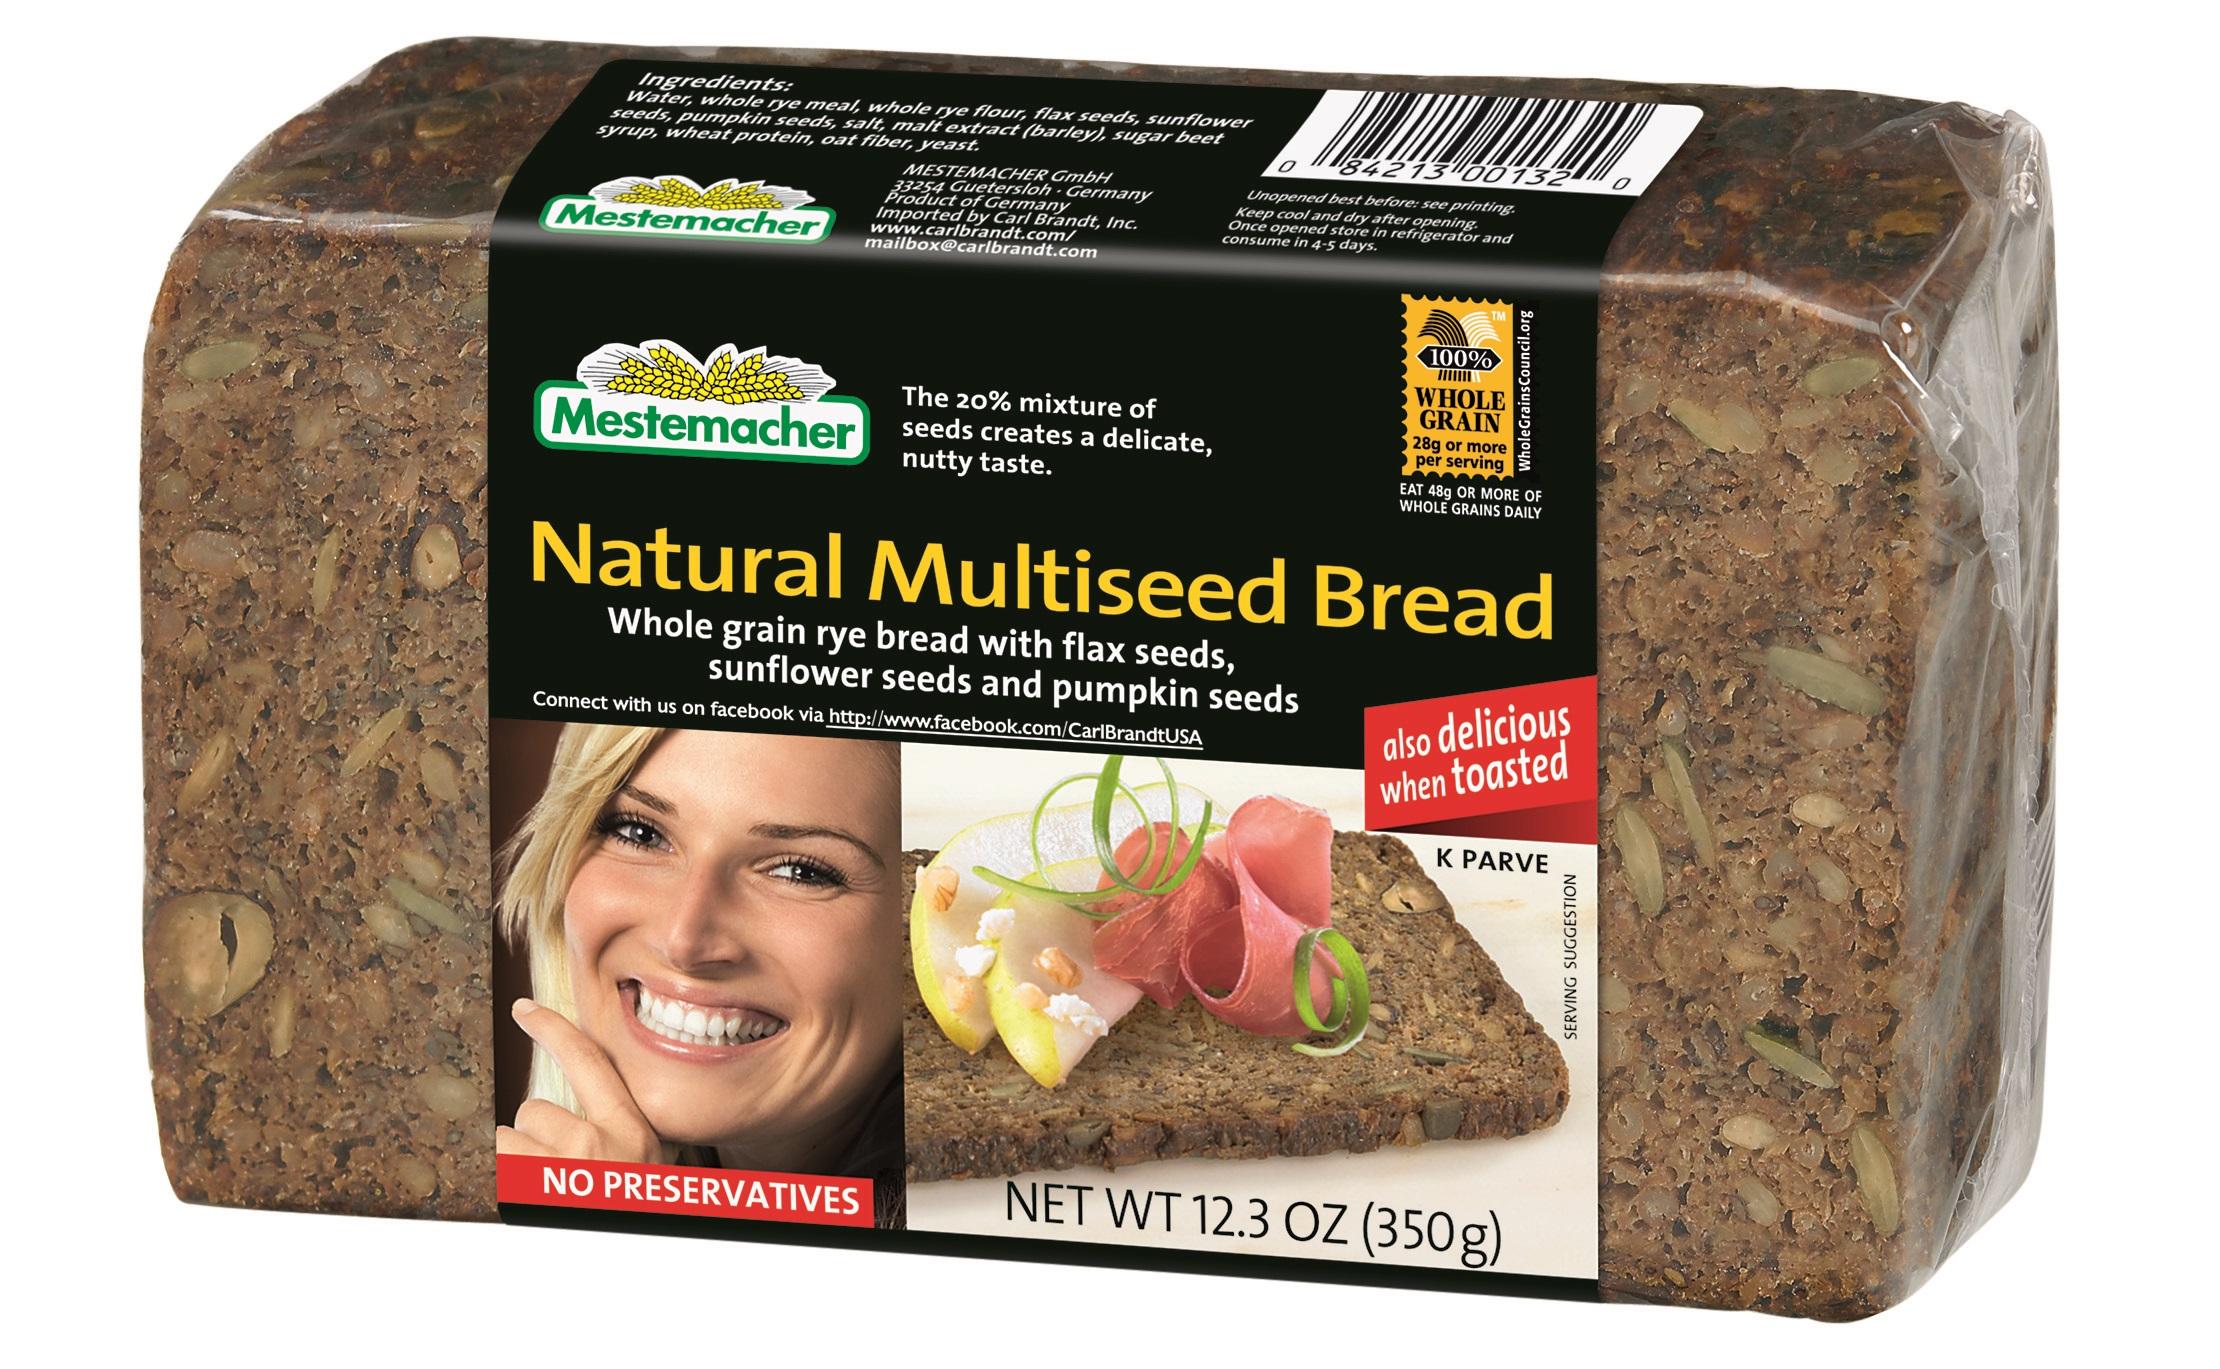 German Bread Names Named Mestemacher Breads